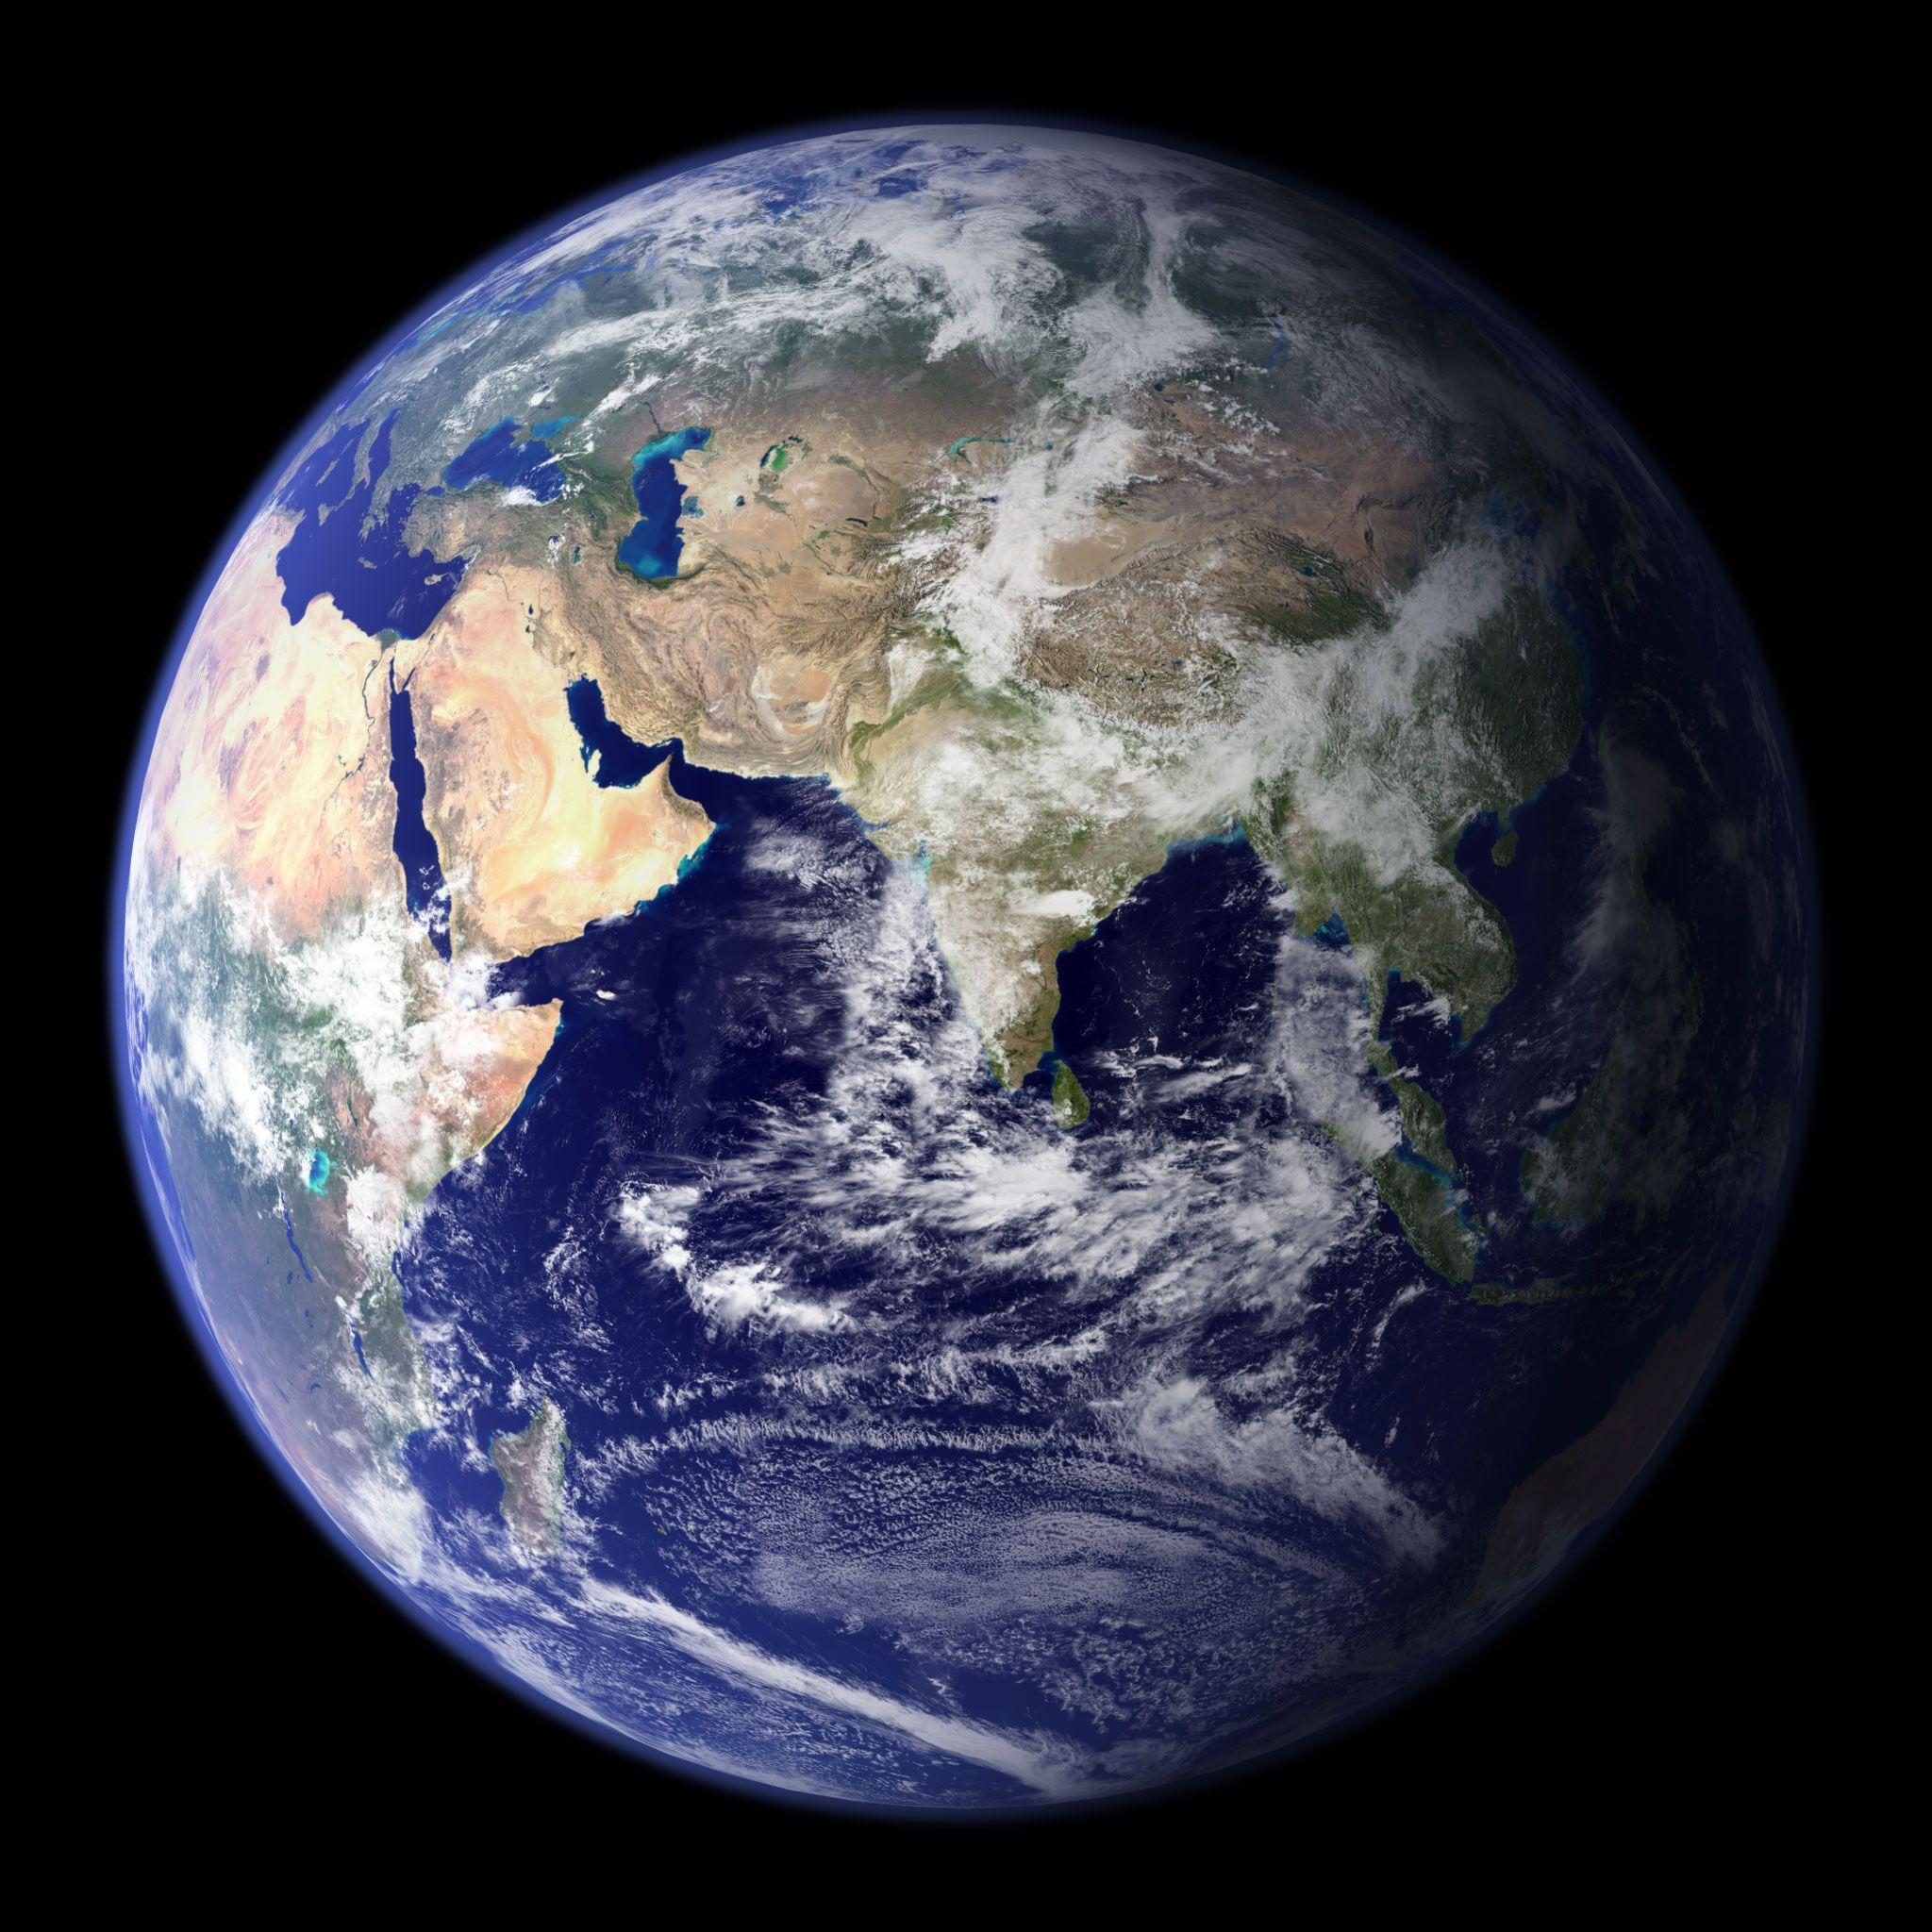 Earth High Resolution Wallpaper Nasa